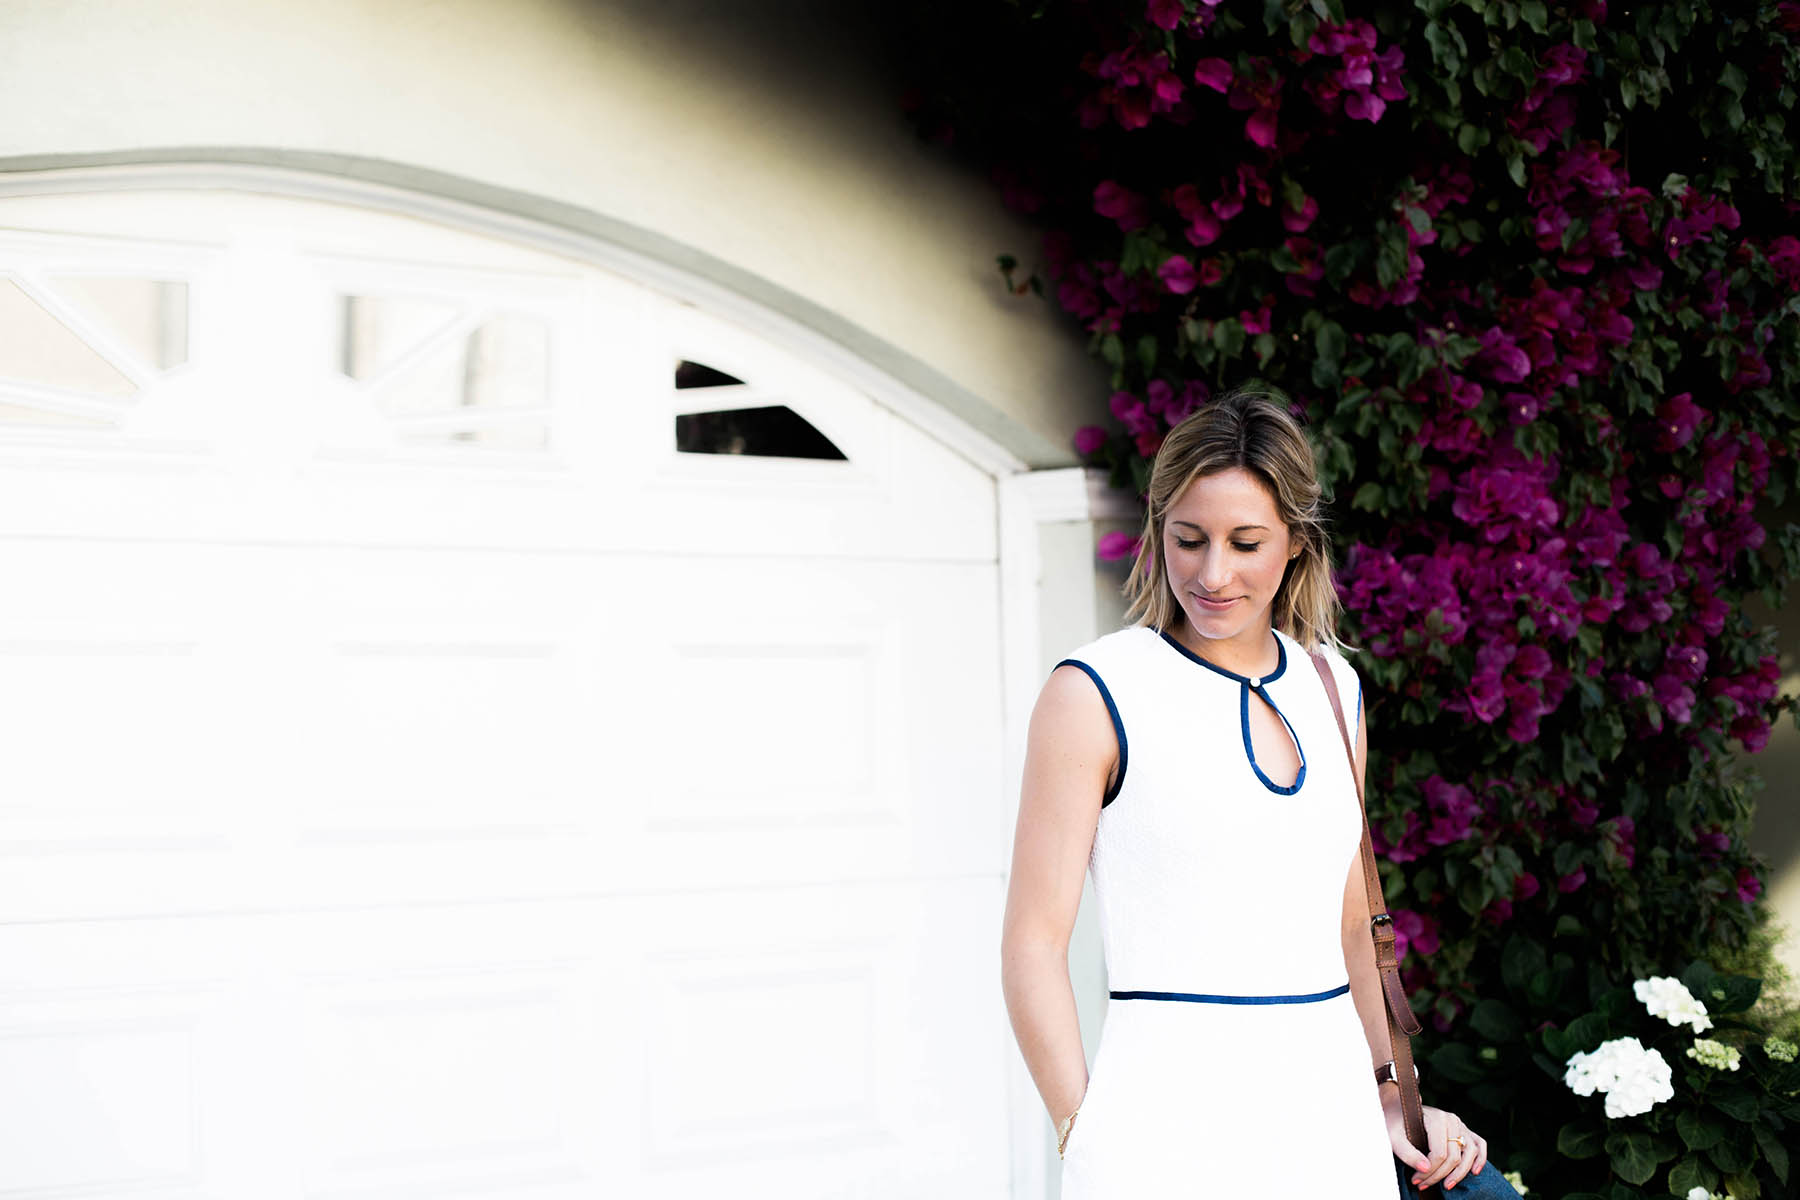 Amanda Holstein in Draper James white dress